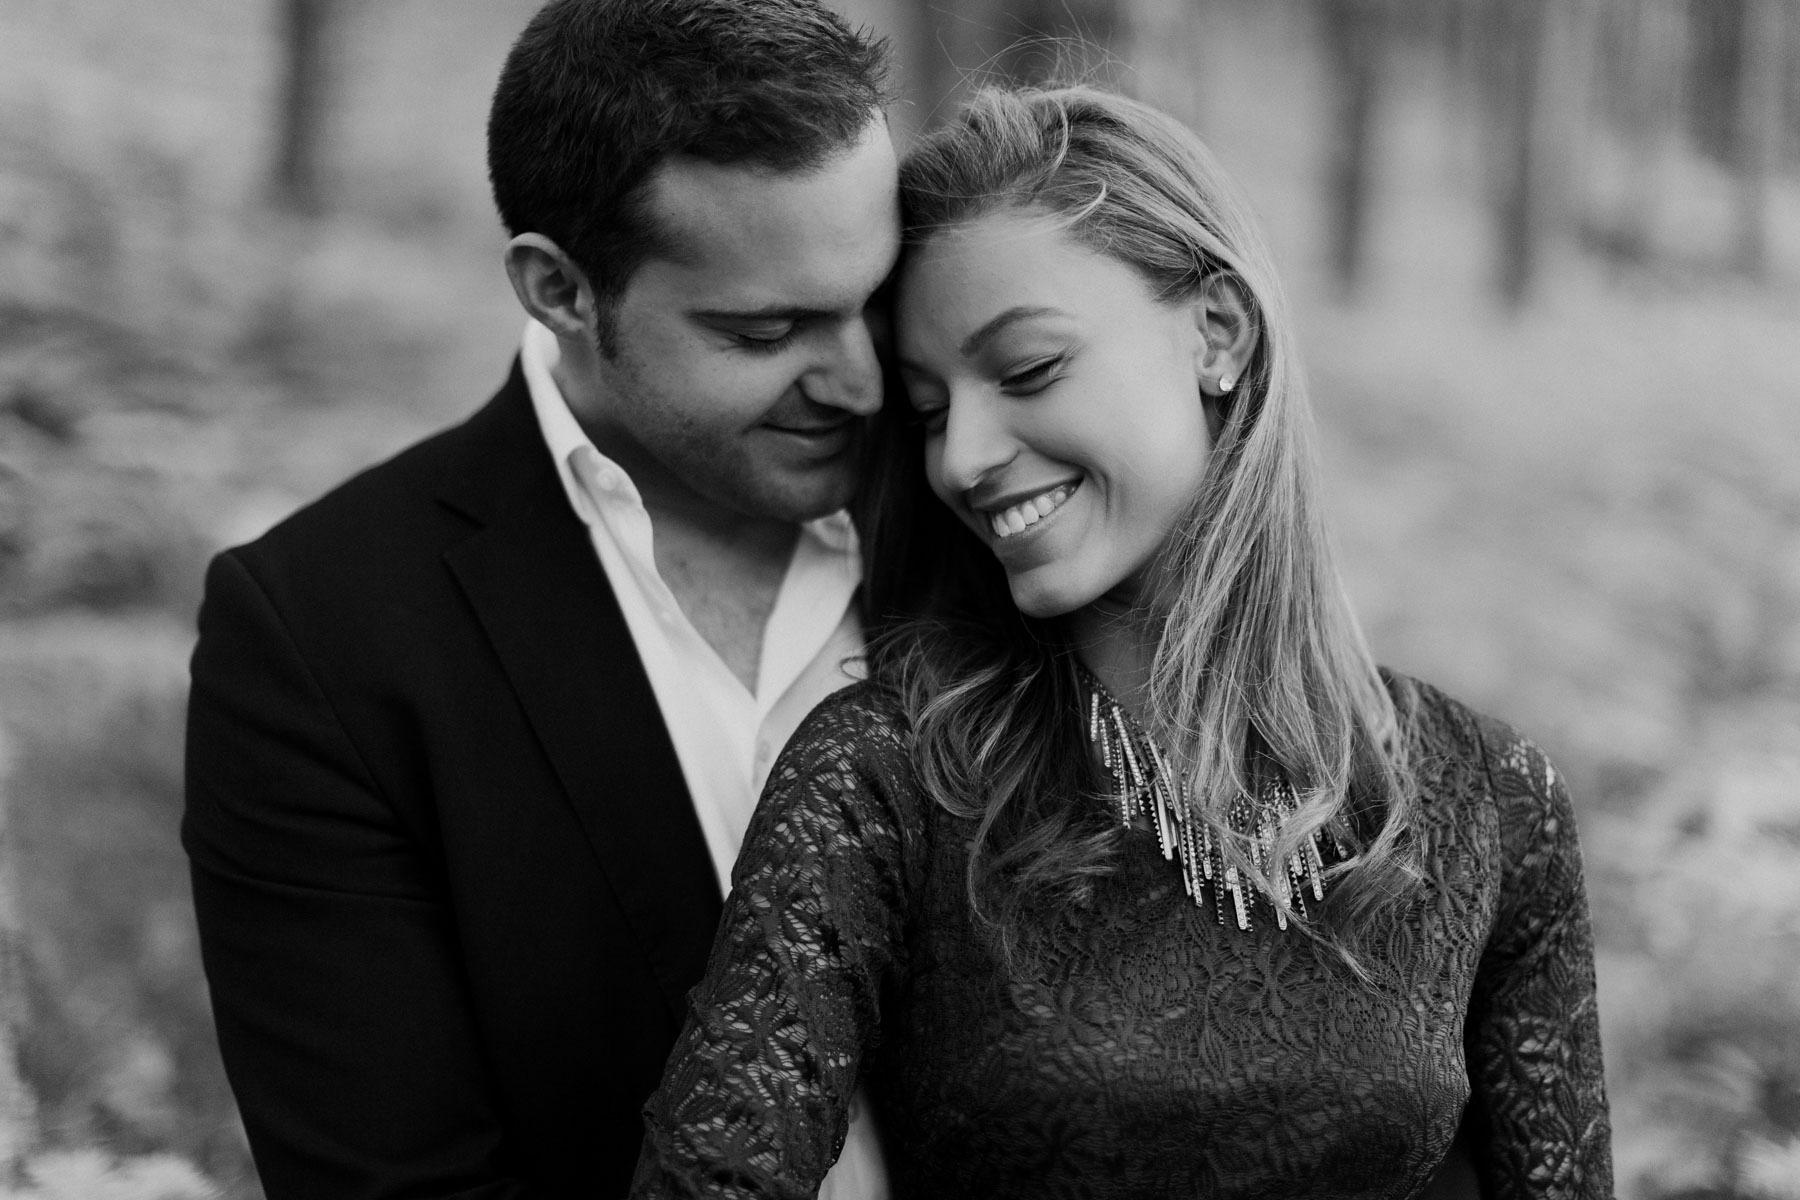 fotografo de bodas Jairo Crena-159